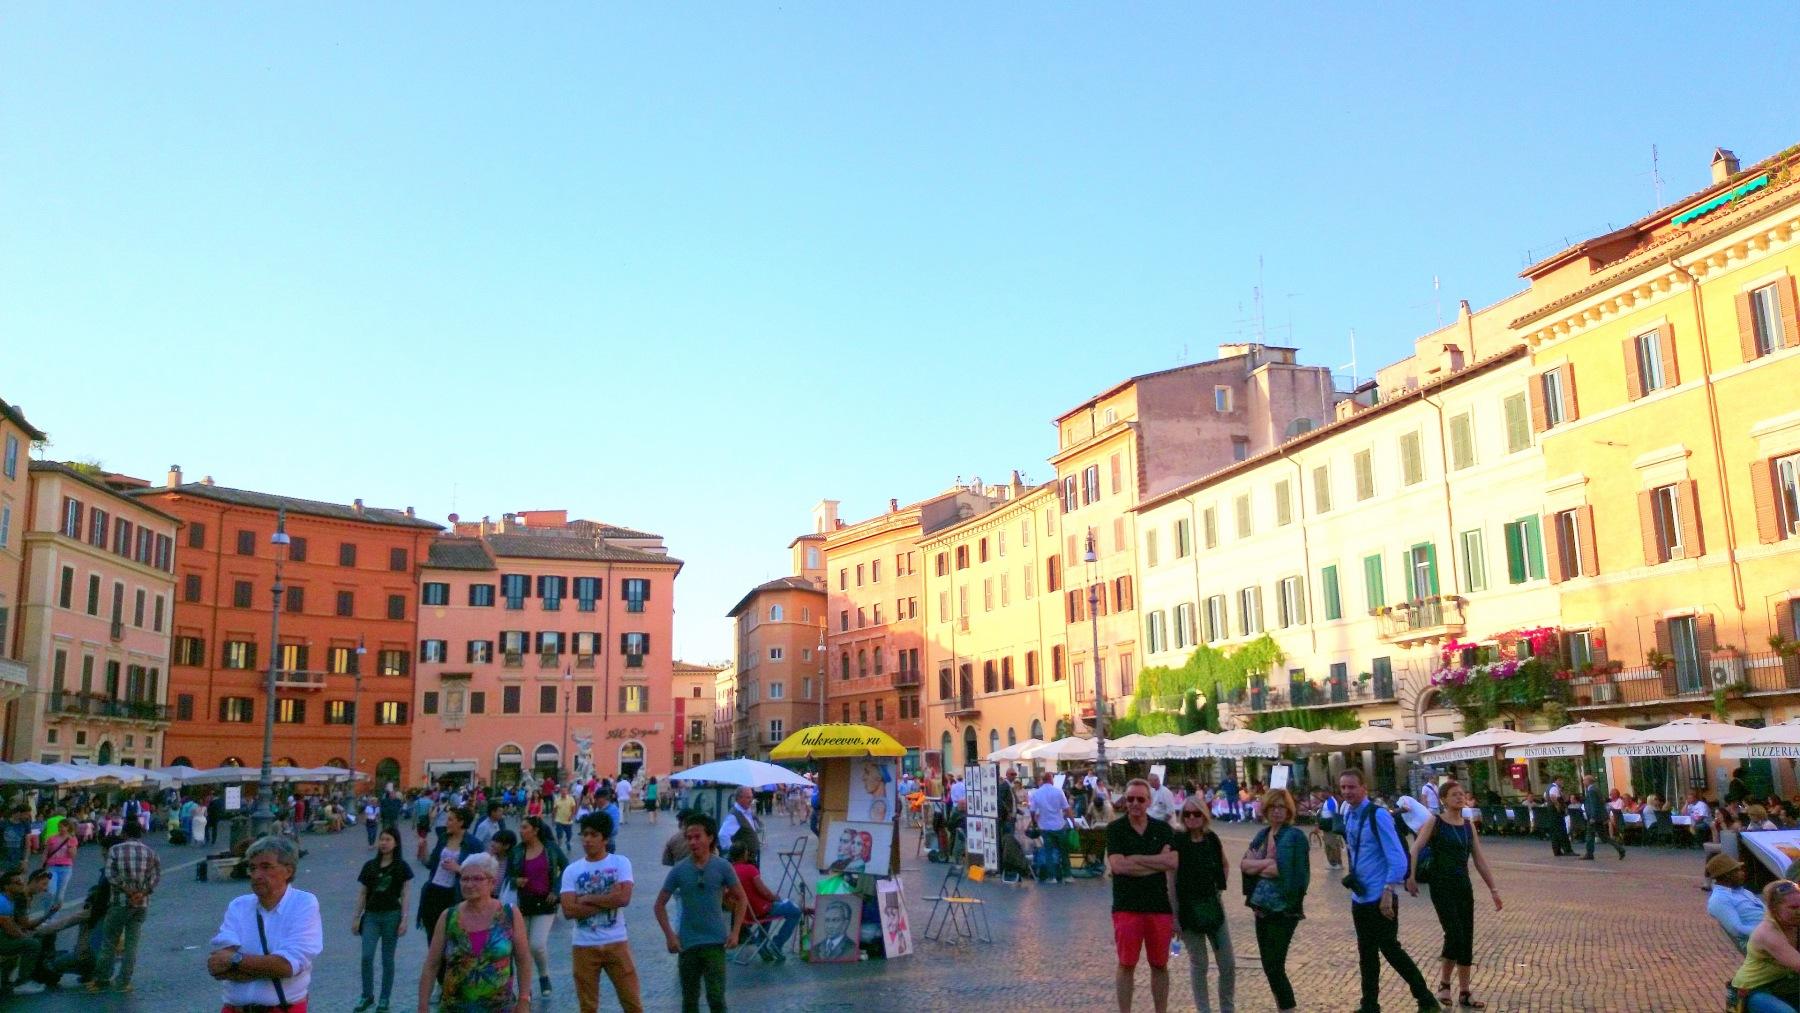 Piazza Navona 49